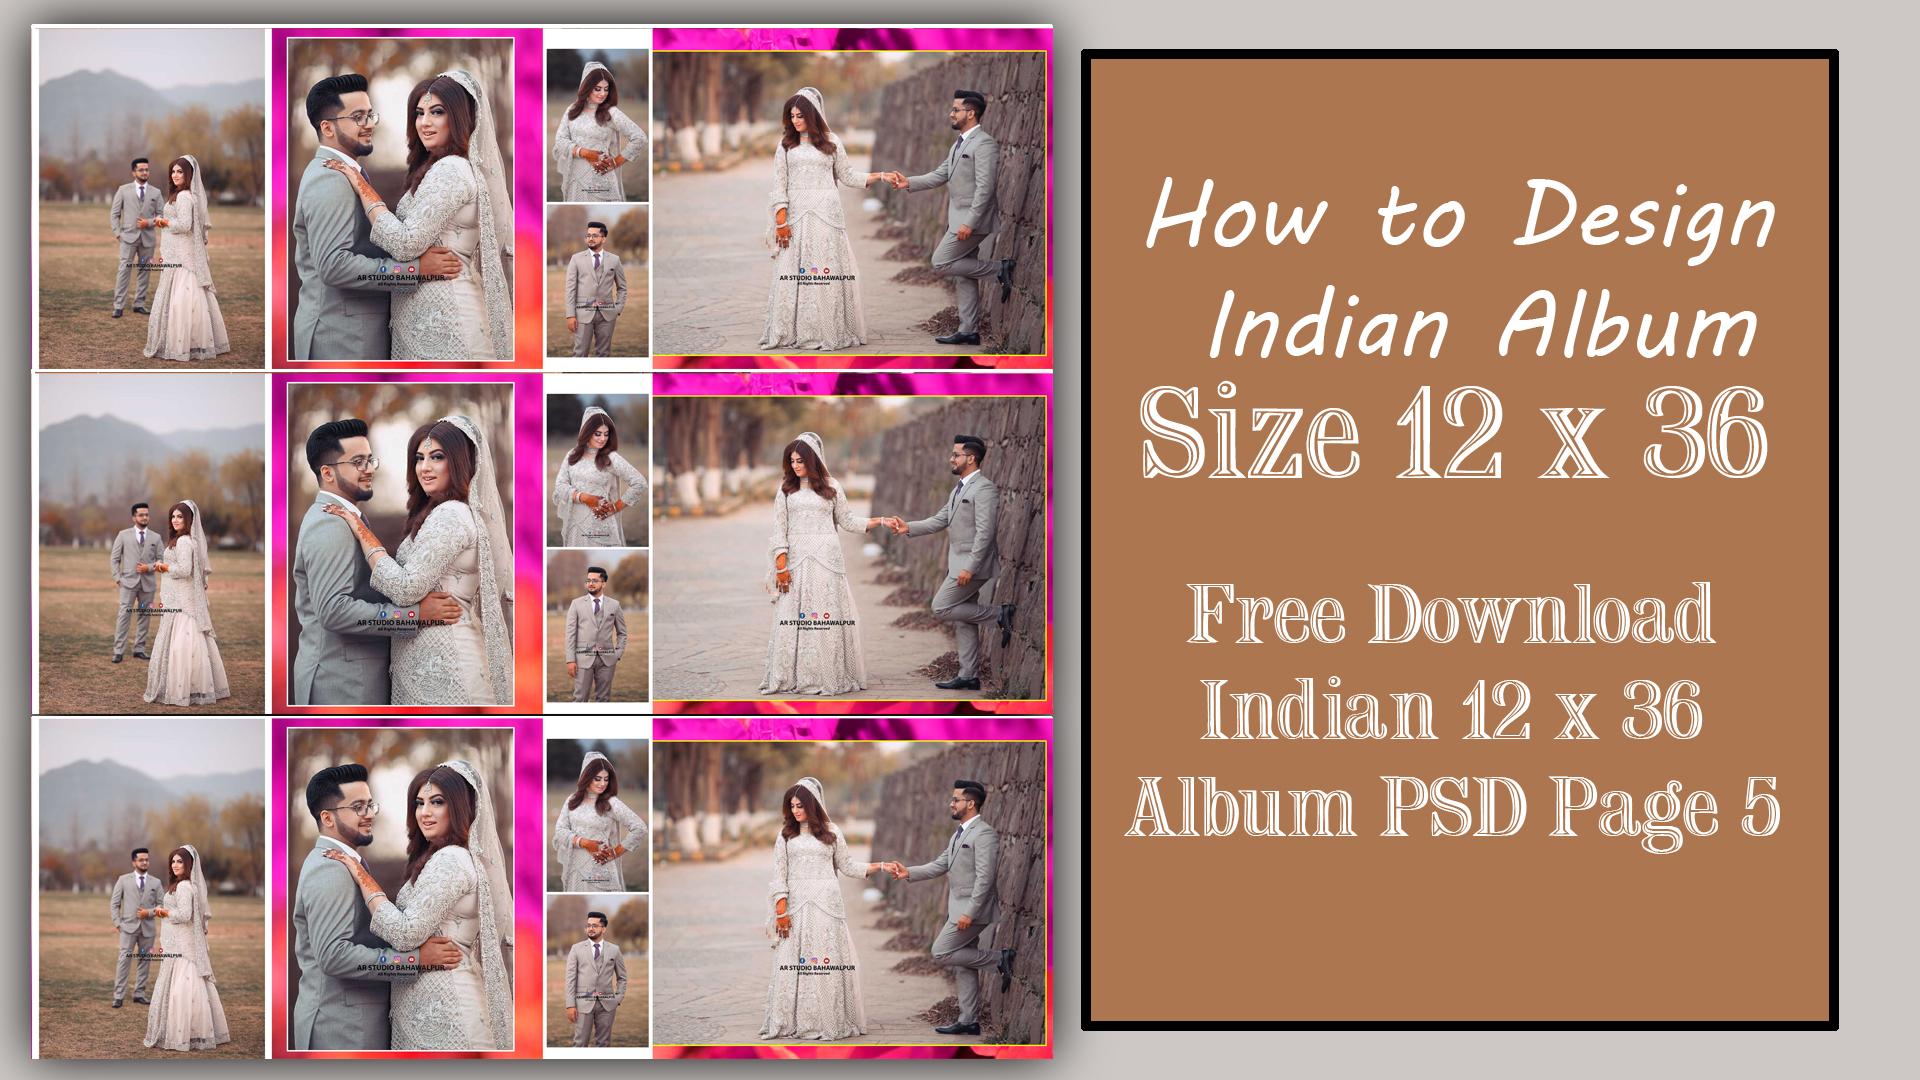 Wedding album design PSD free download Free Albums